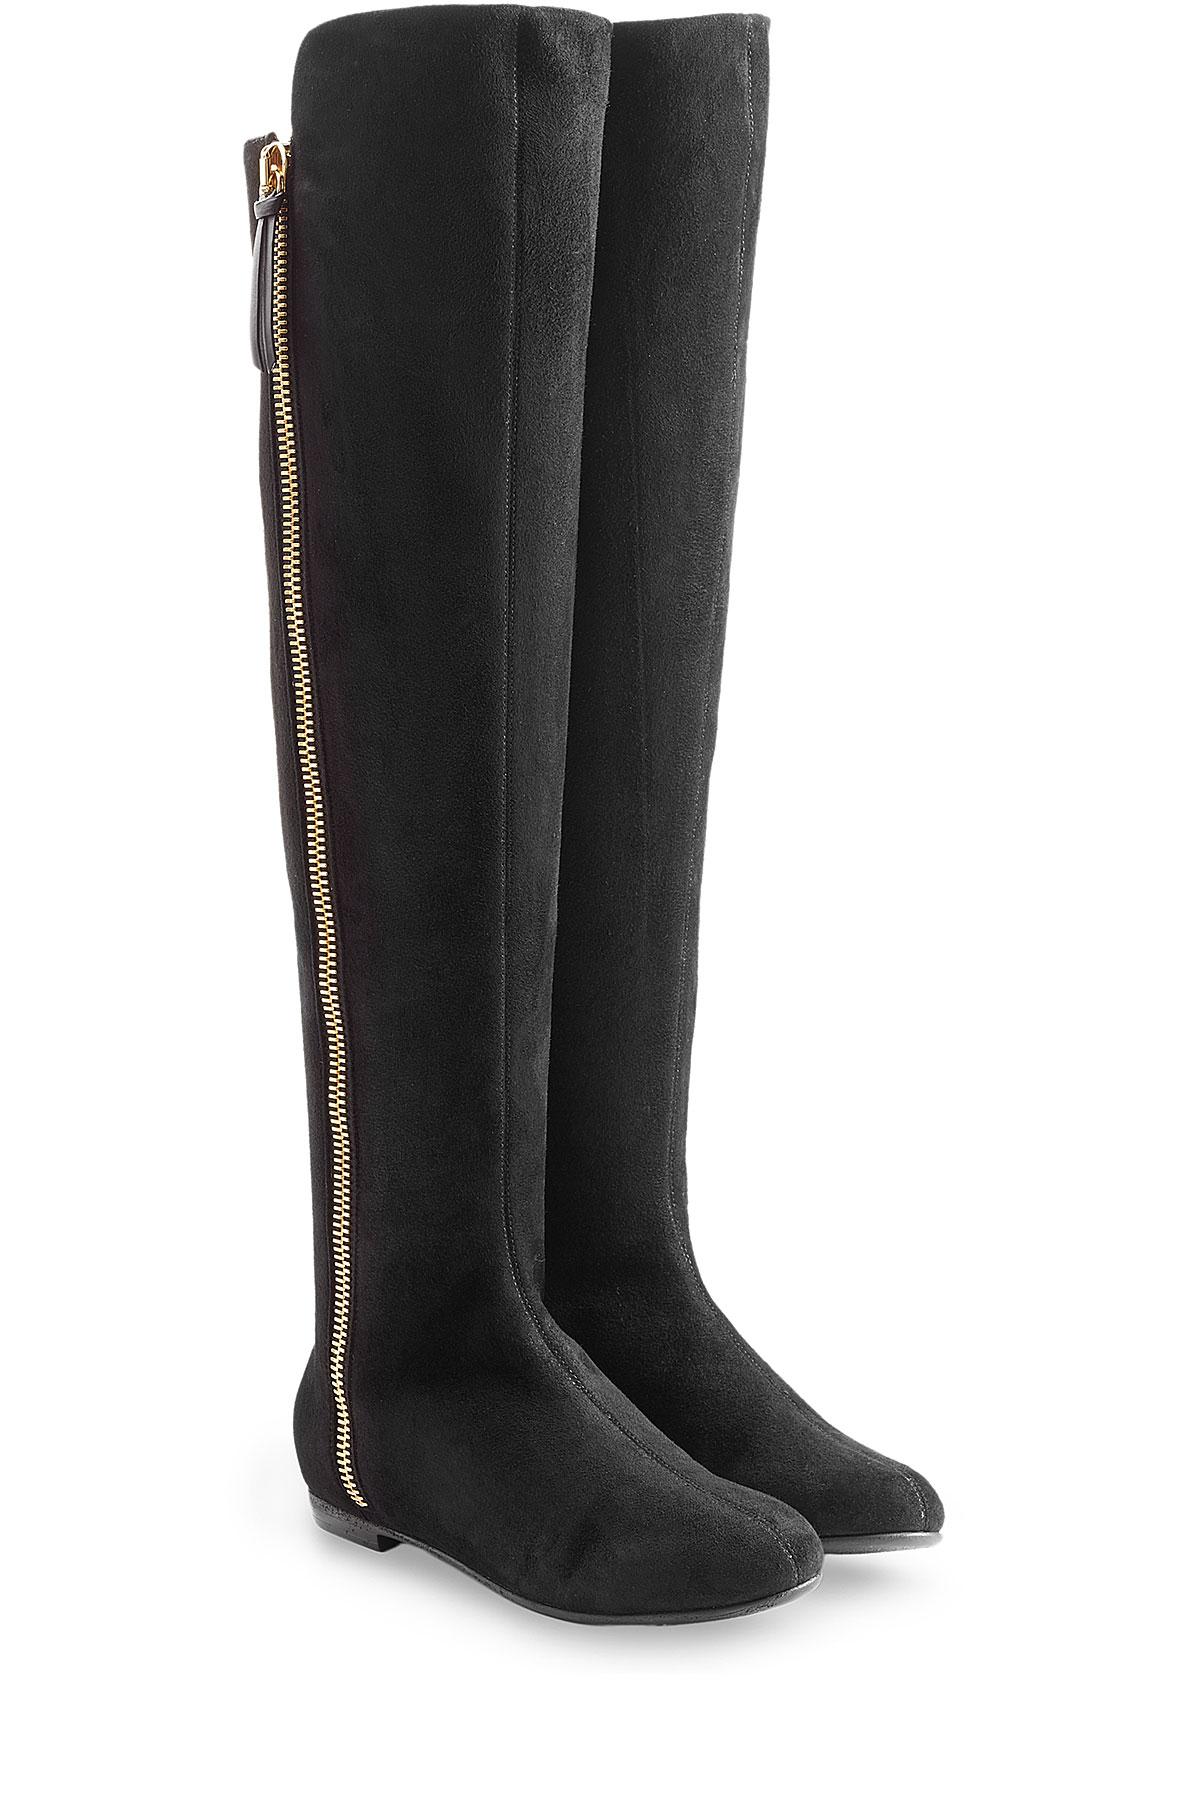 da41f1a0f30 Lyst - Giuseppe Zanotti Over-the-knee Suede Boots - Black in Black